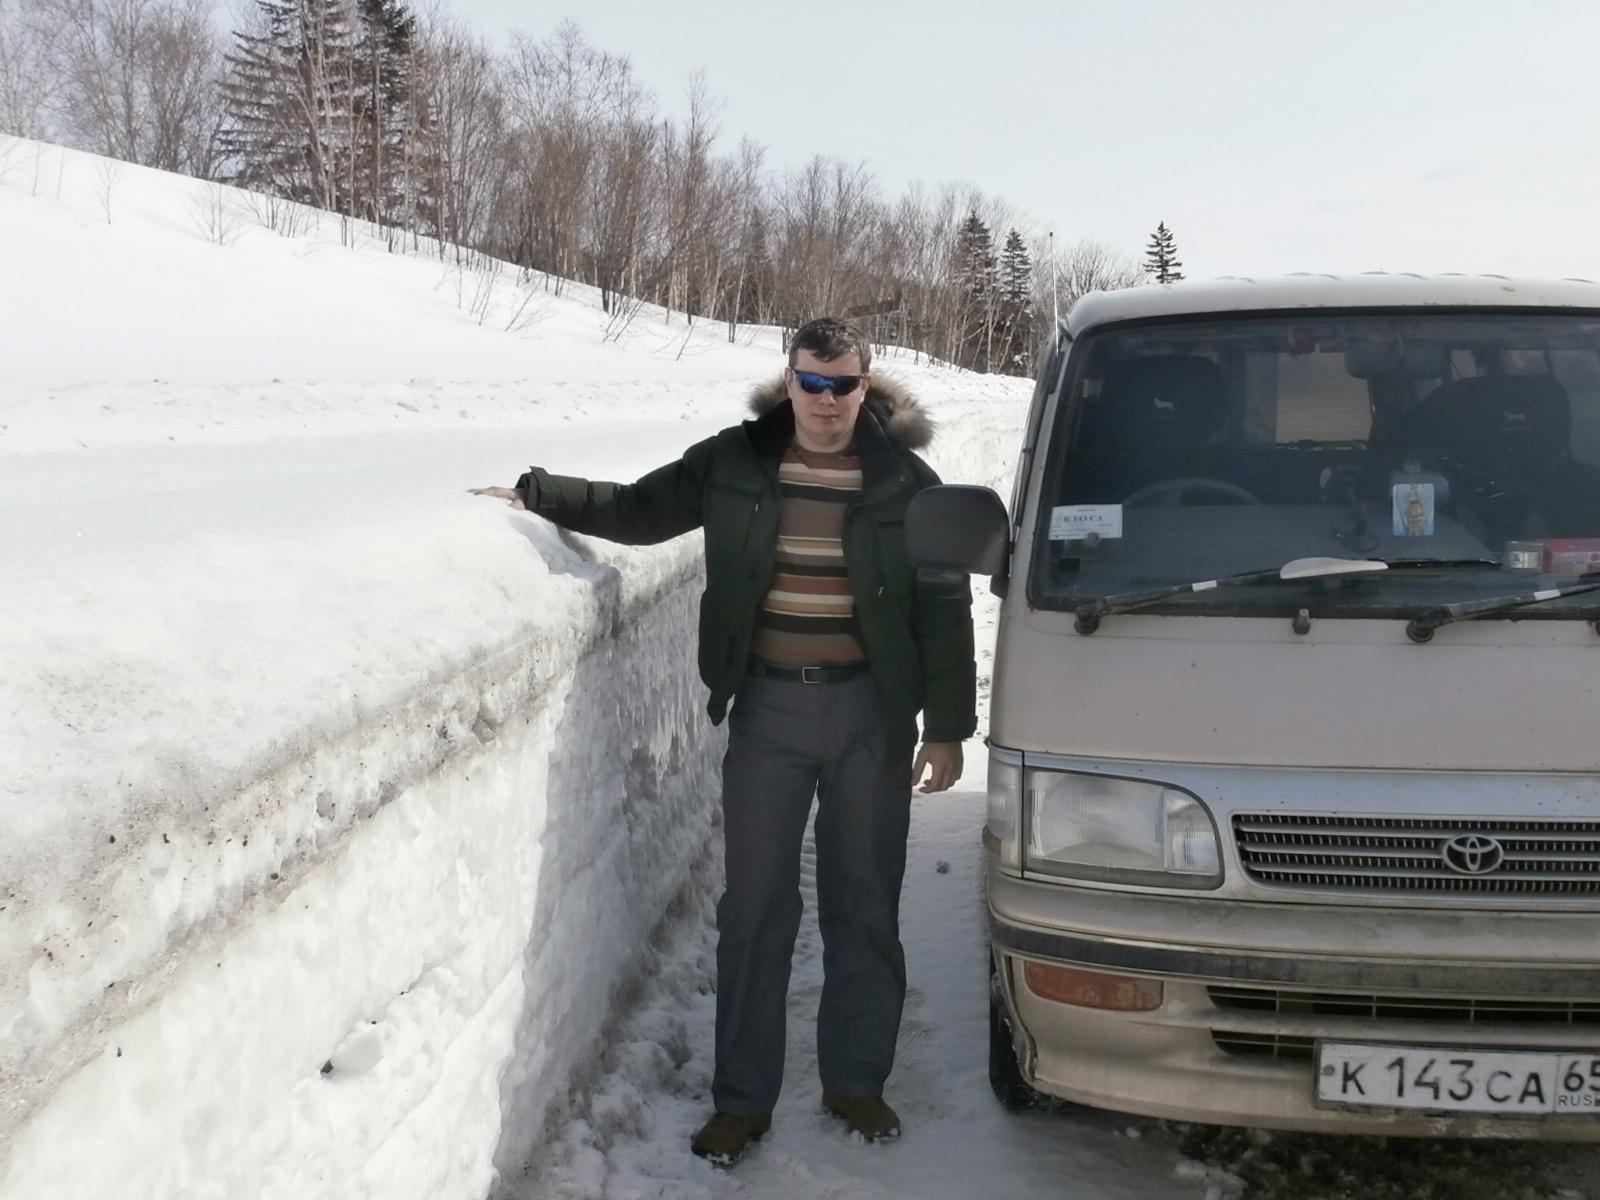 снега намело-дорога